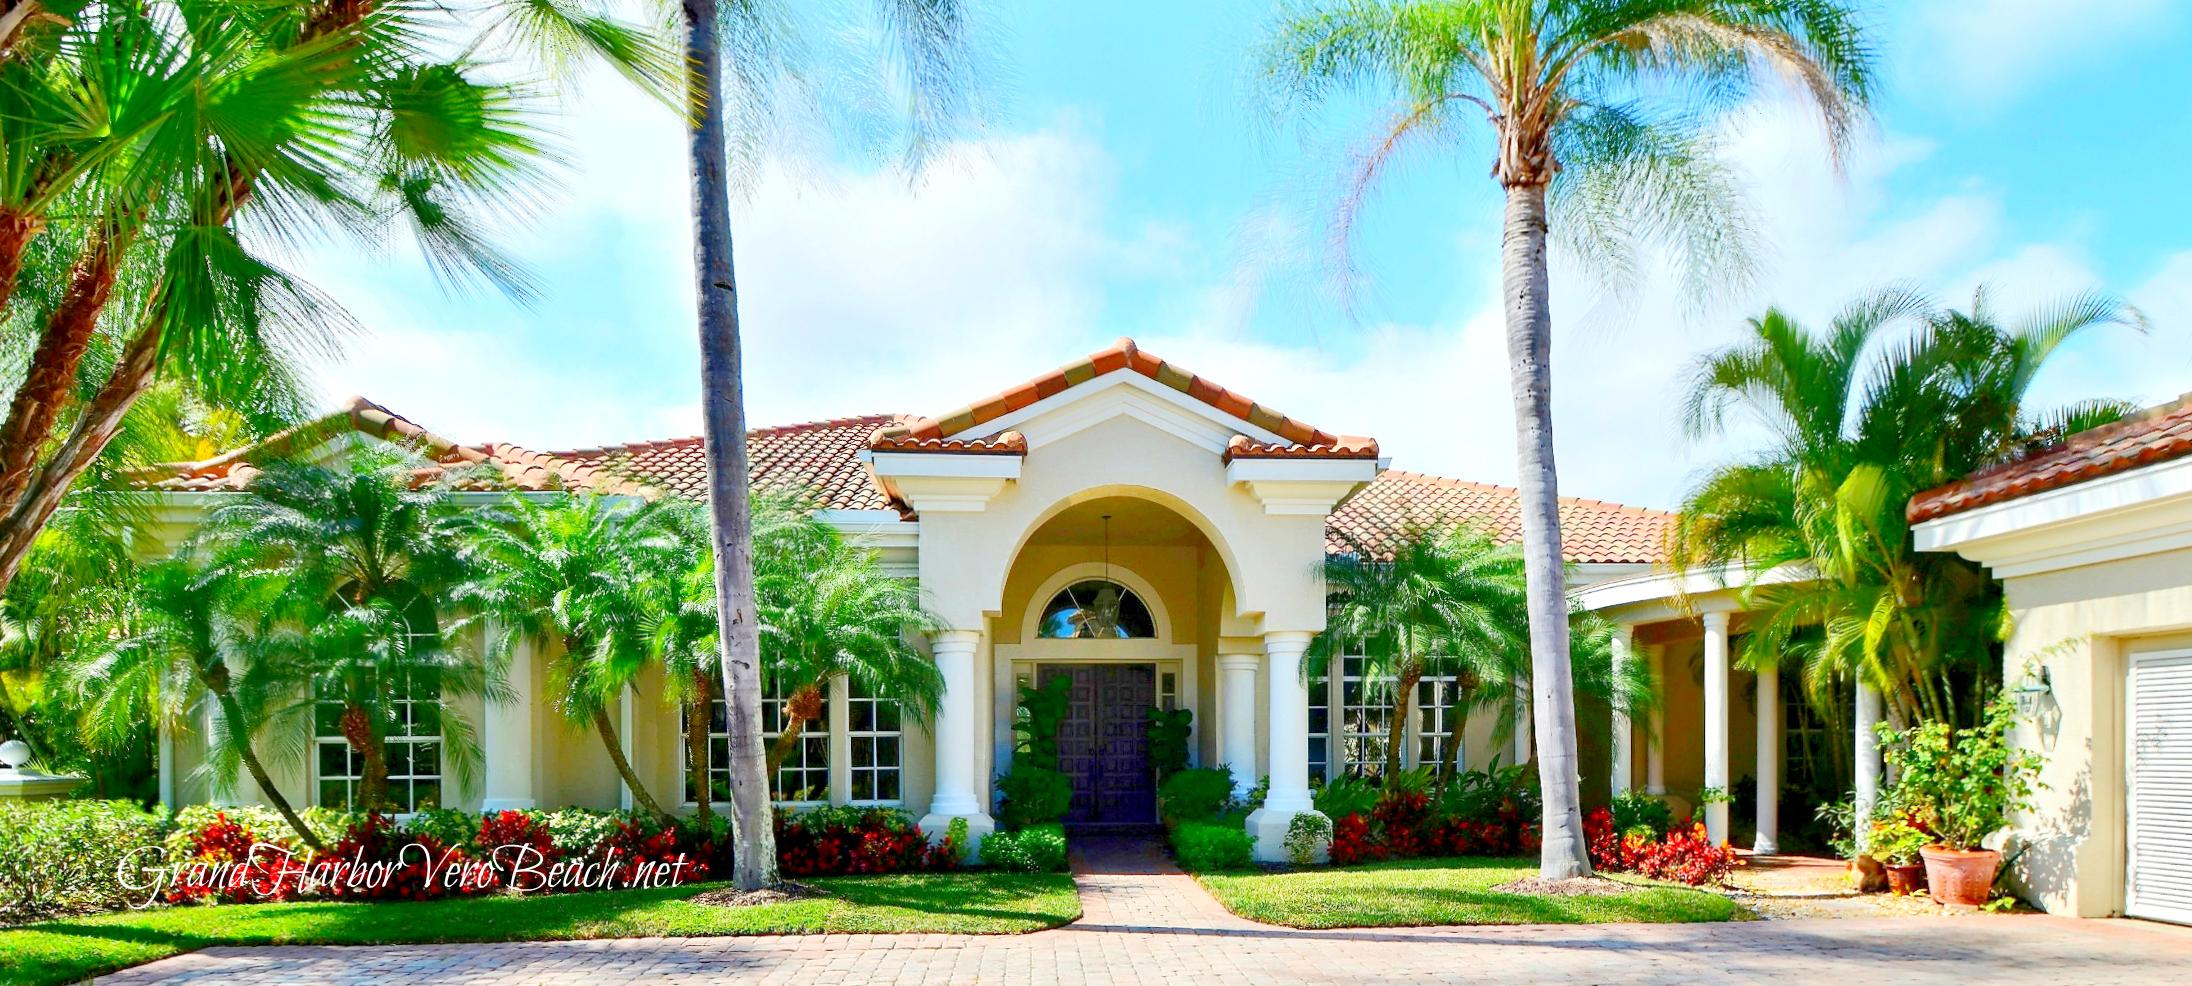 Country Kitchen Vero Beach Country Club Homes Vero Beach Florida Golf And The Beach